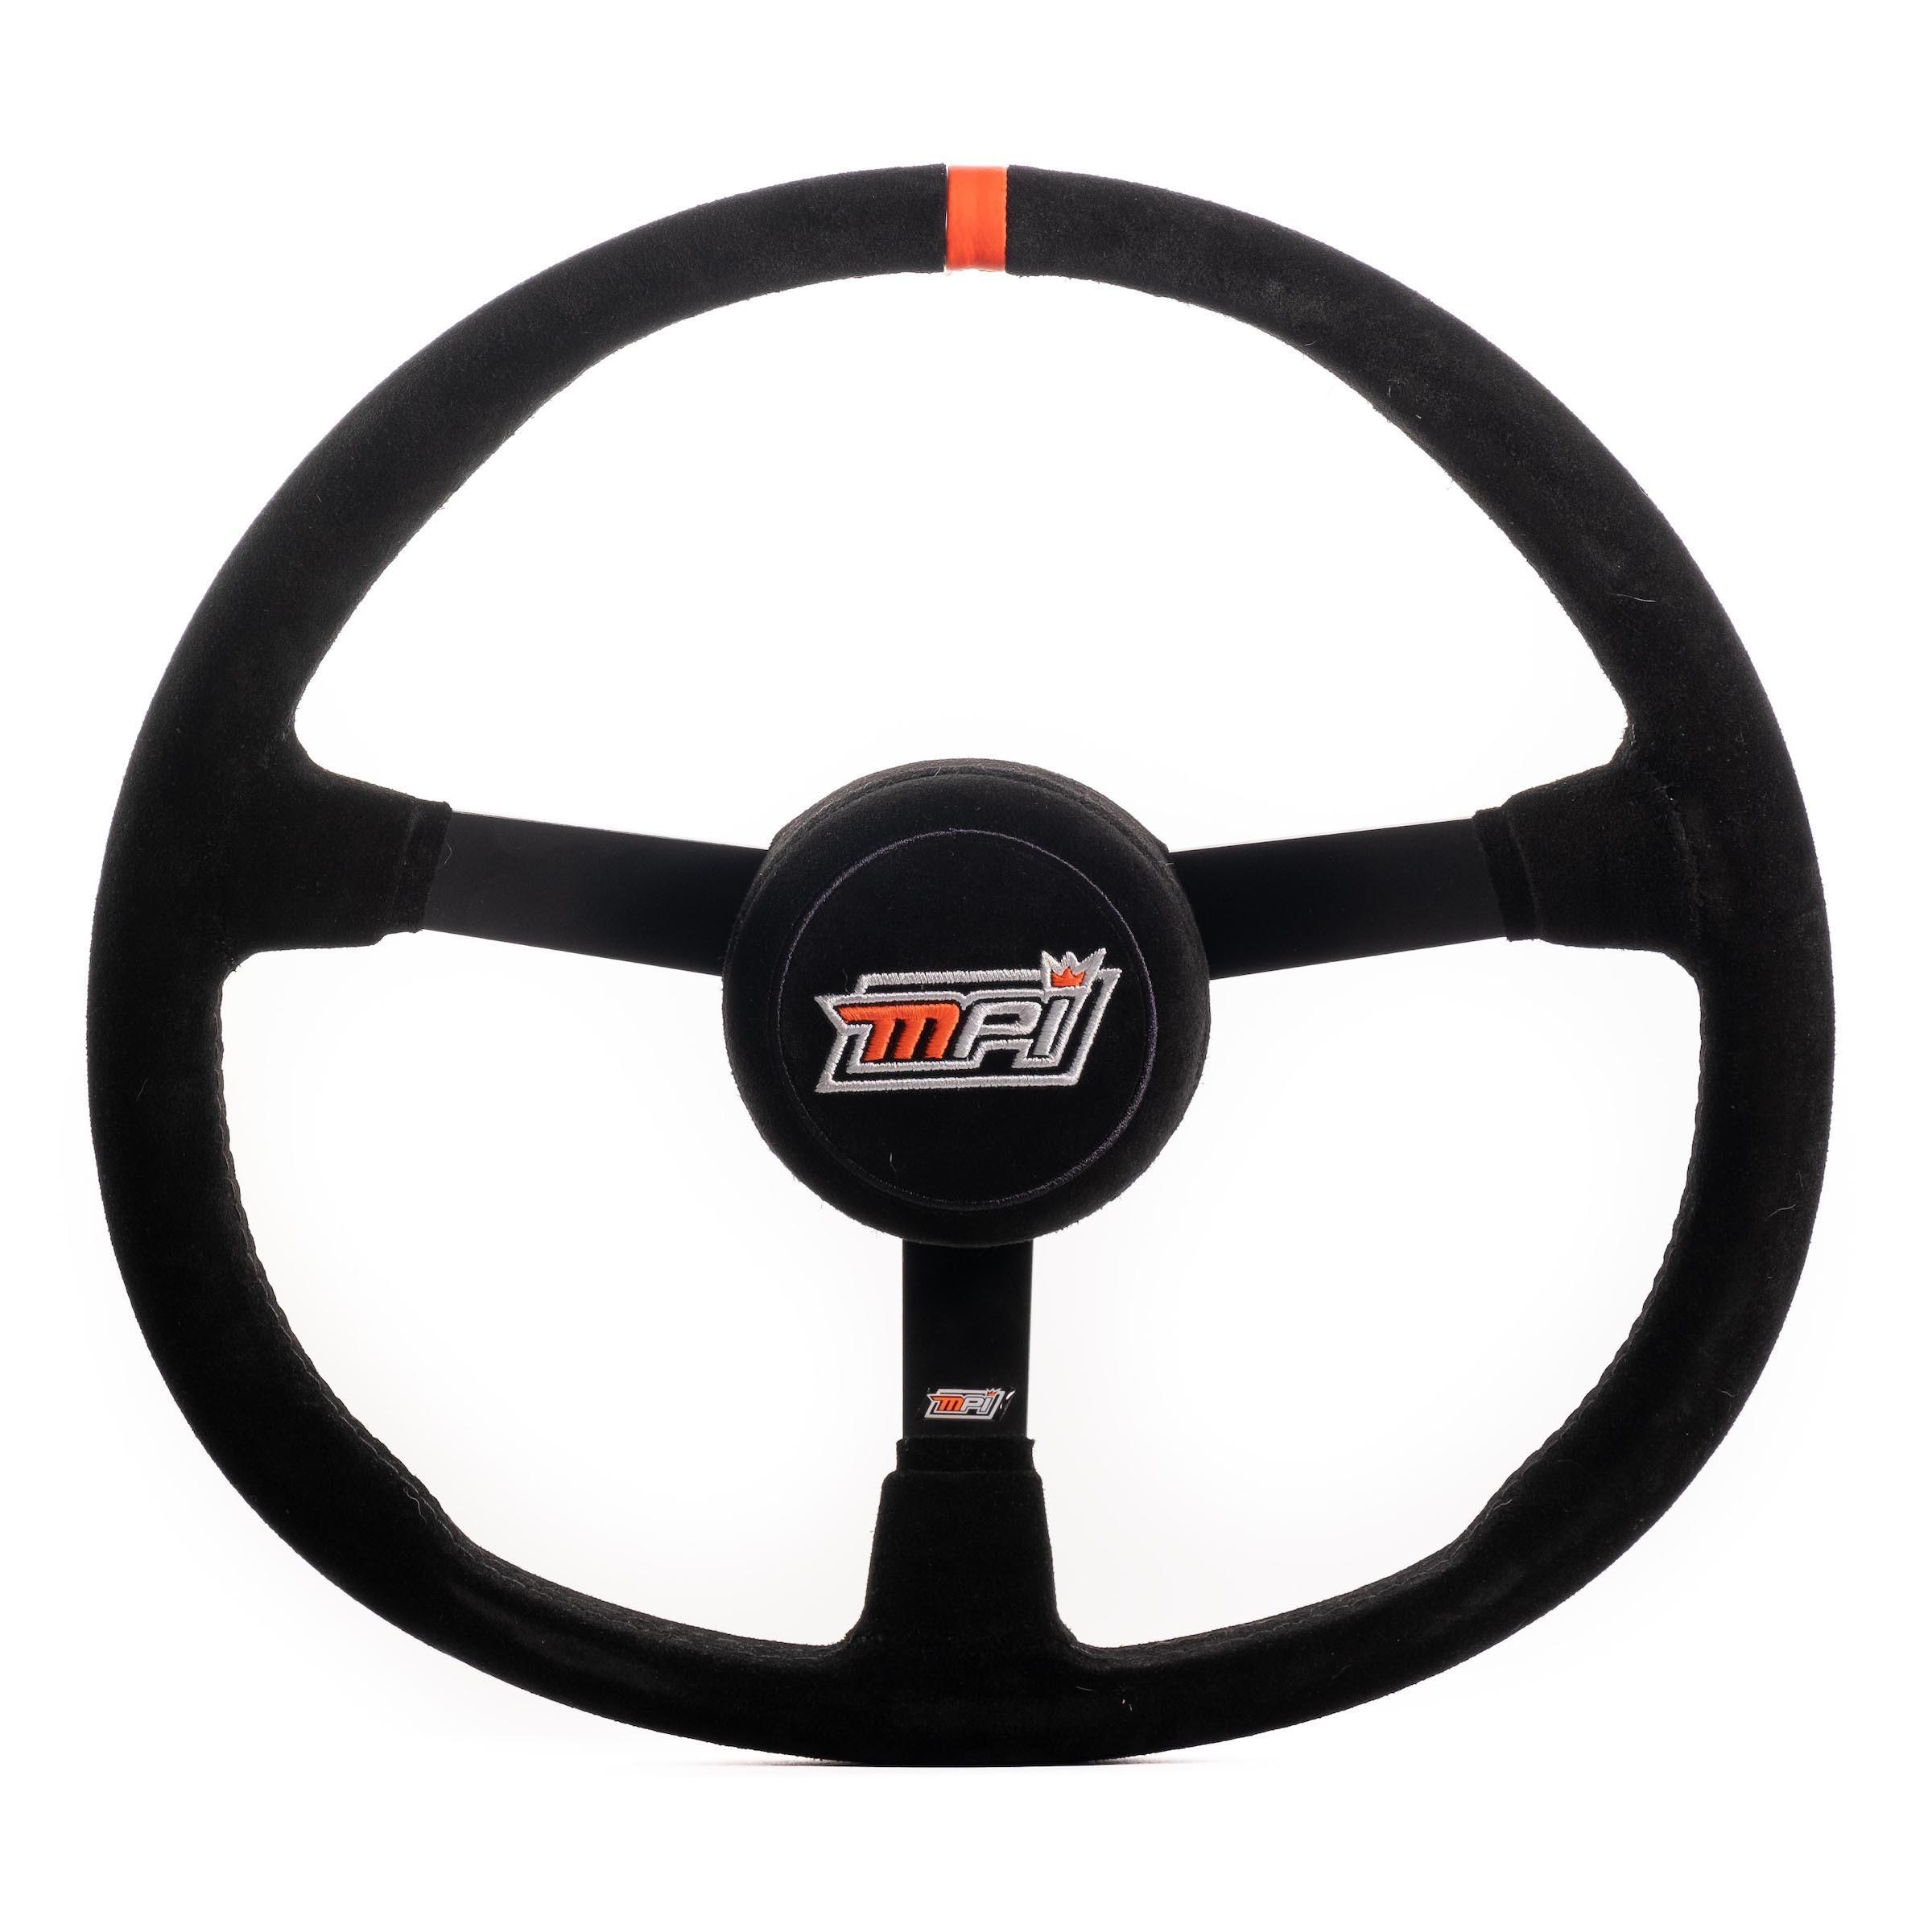 MPI USA MPI-MP2-15 Steering Wheel, Asphalt Circle Track, 15 in Diameter, 3-Spoke, 3-1/4 in Dish, Black Suede Grip, Orange Stripe, Thumb Insert, Steel, Black, Each